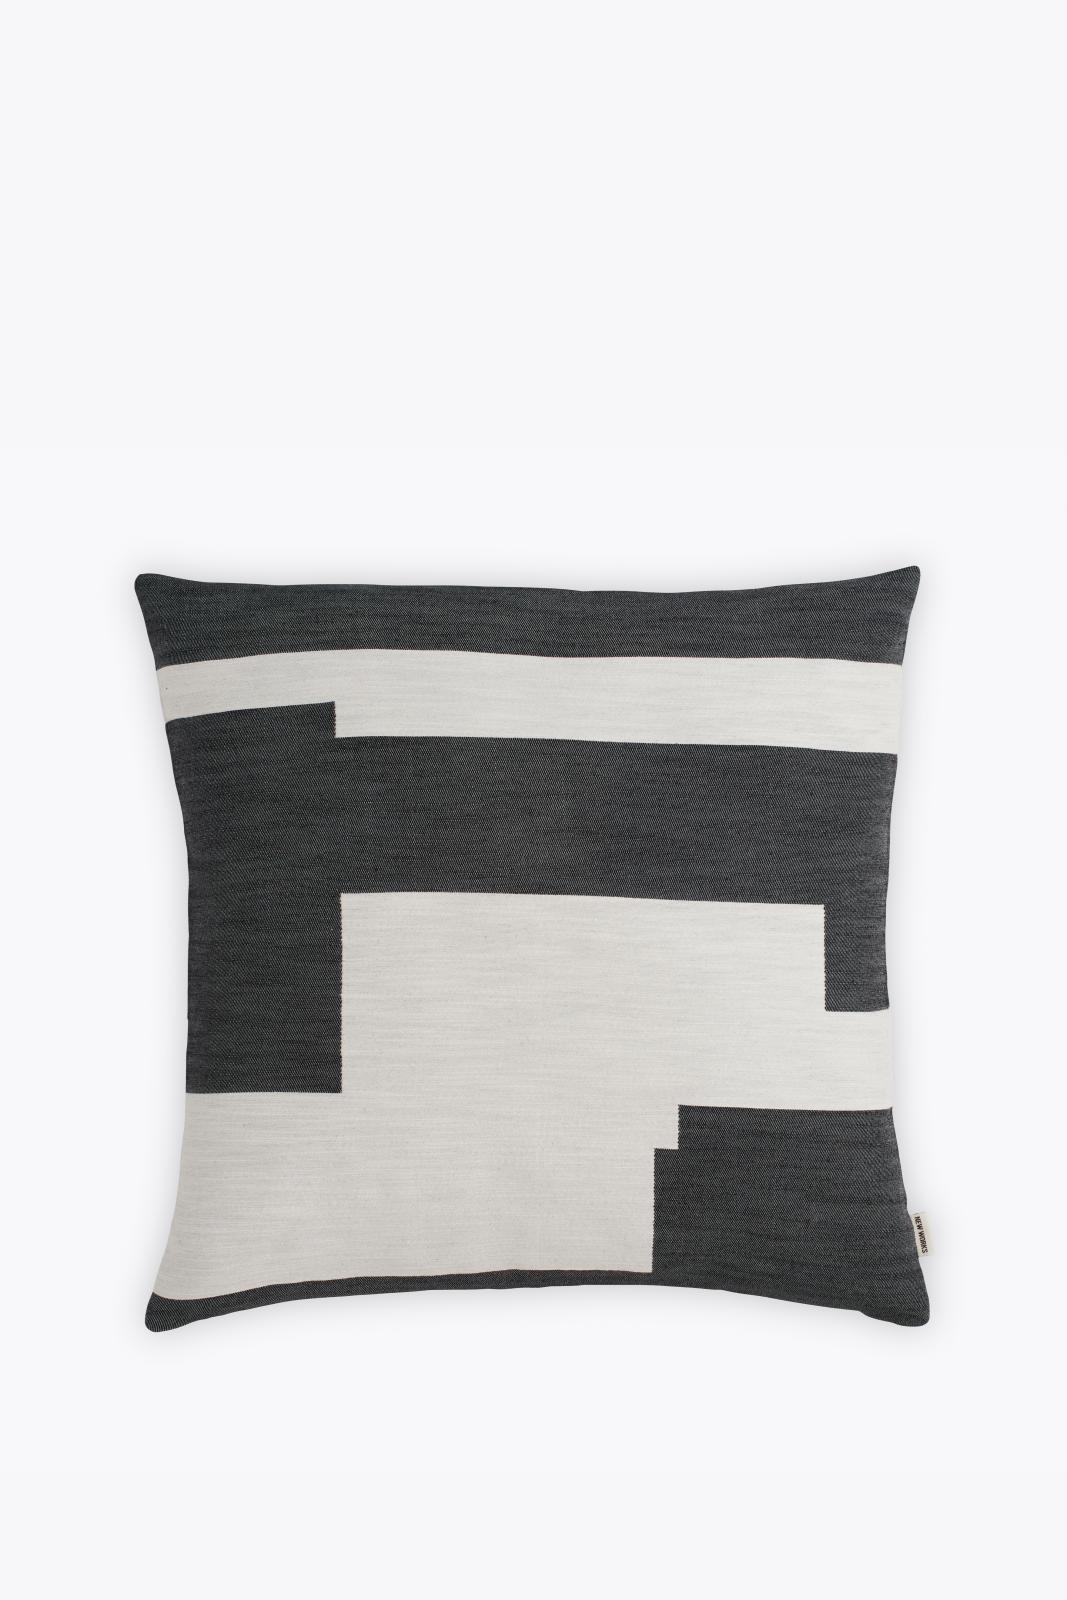 Graphic Square Cushion Black, Large